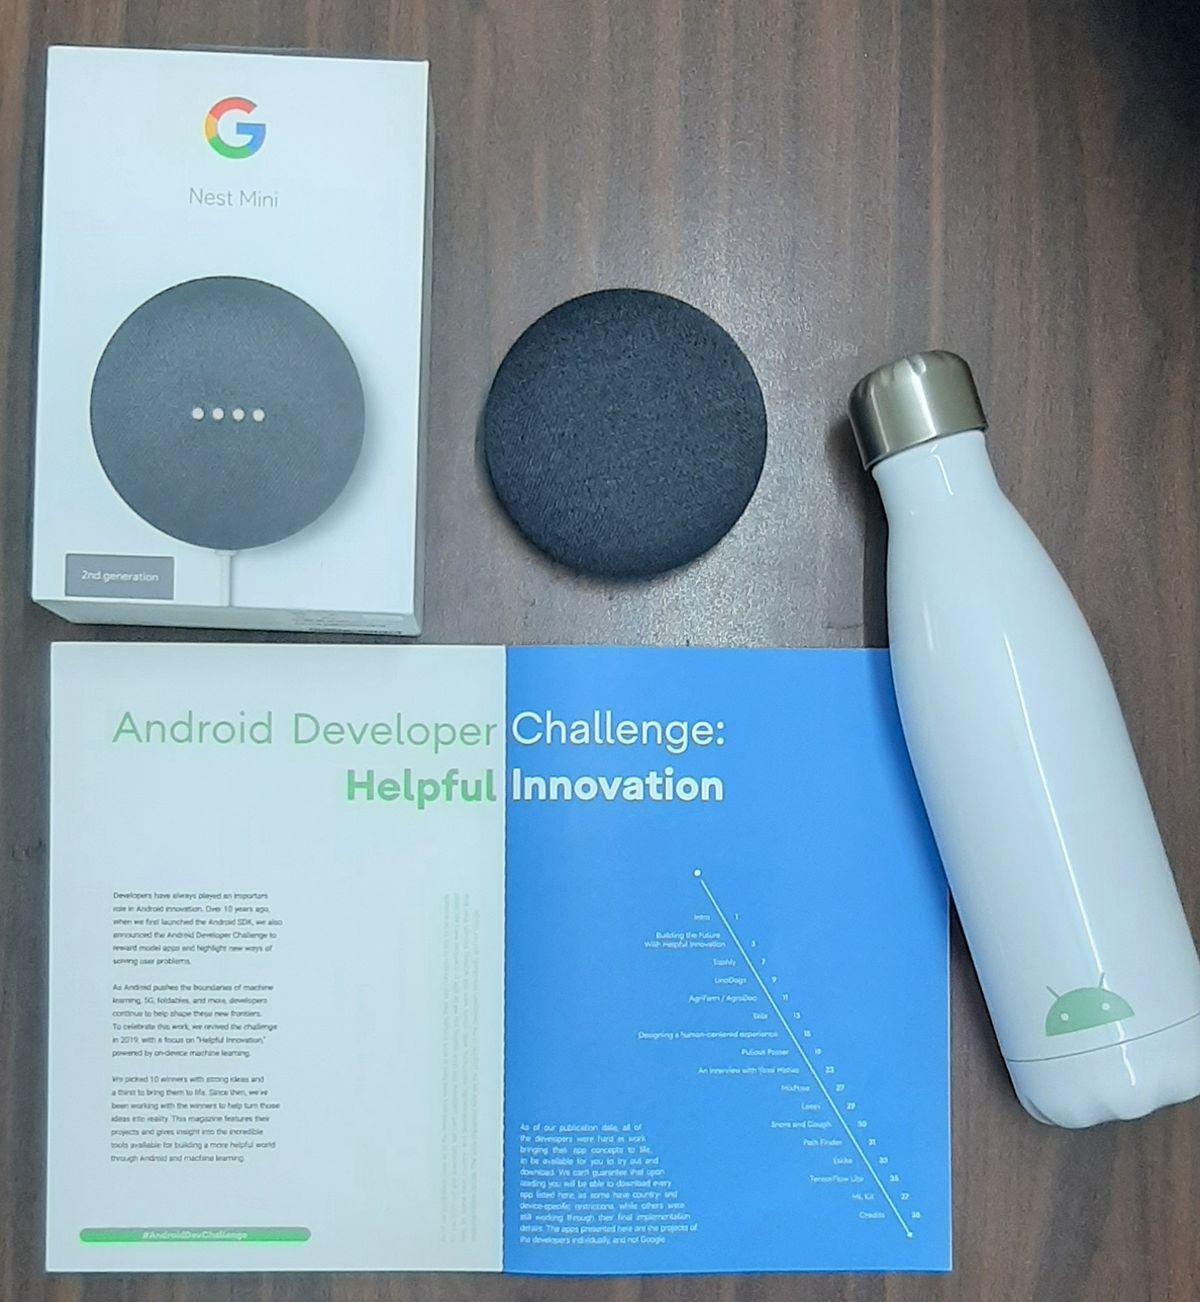 A bottle, Google Nest Mini and the magazine